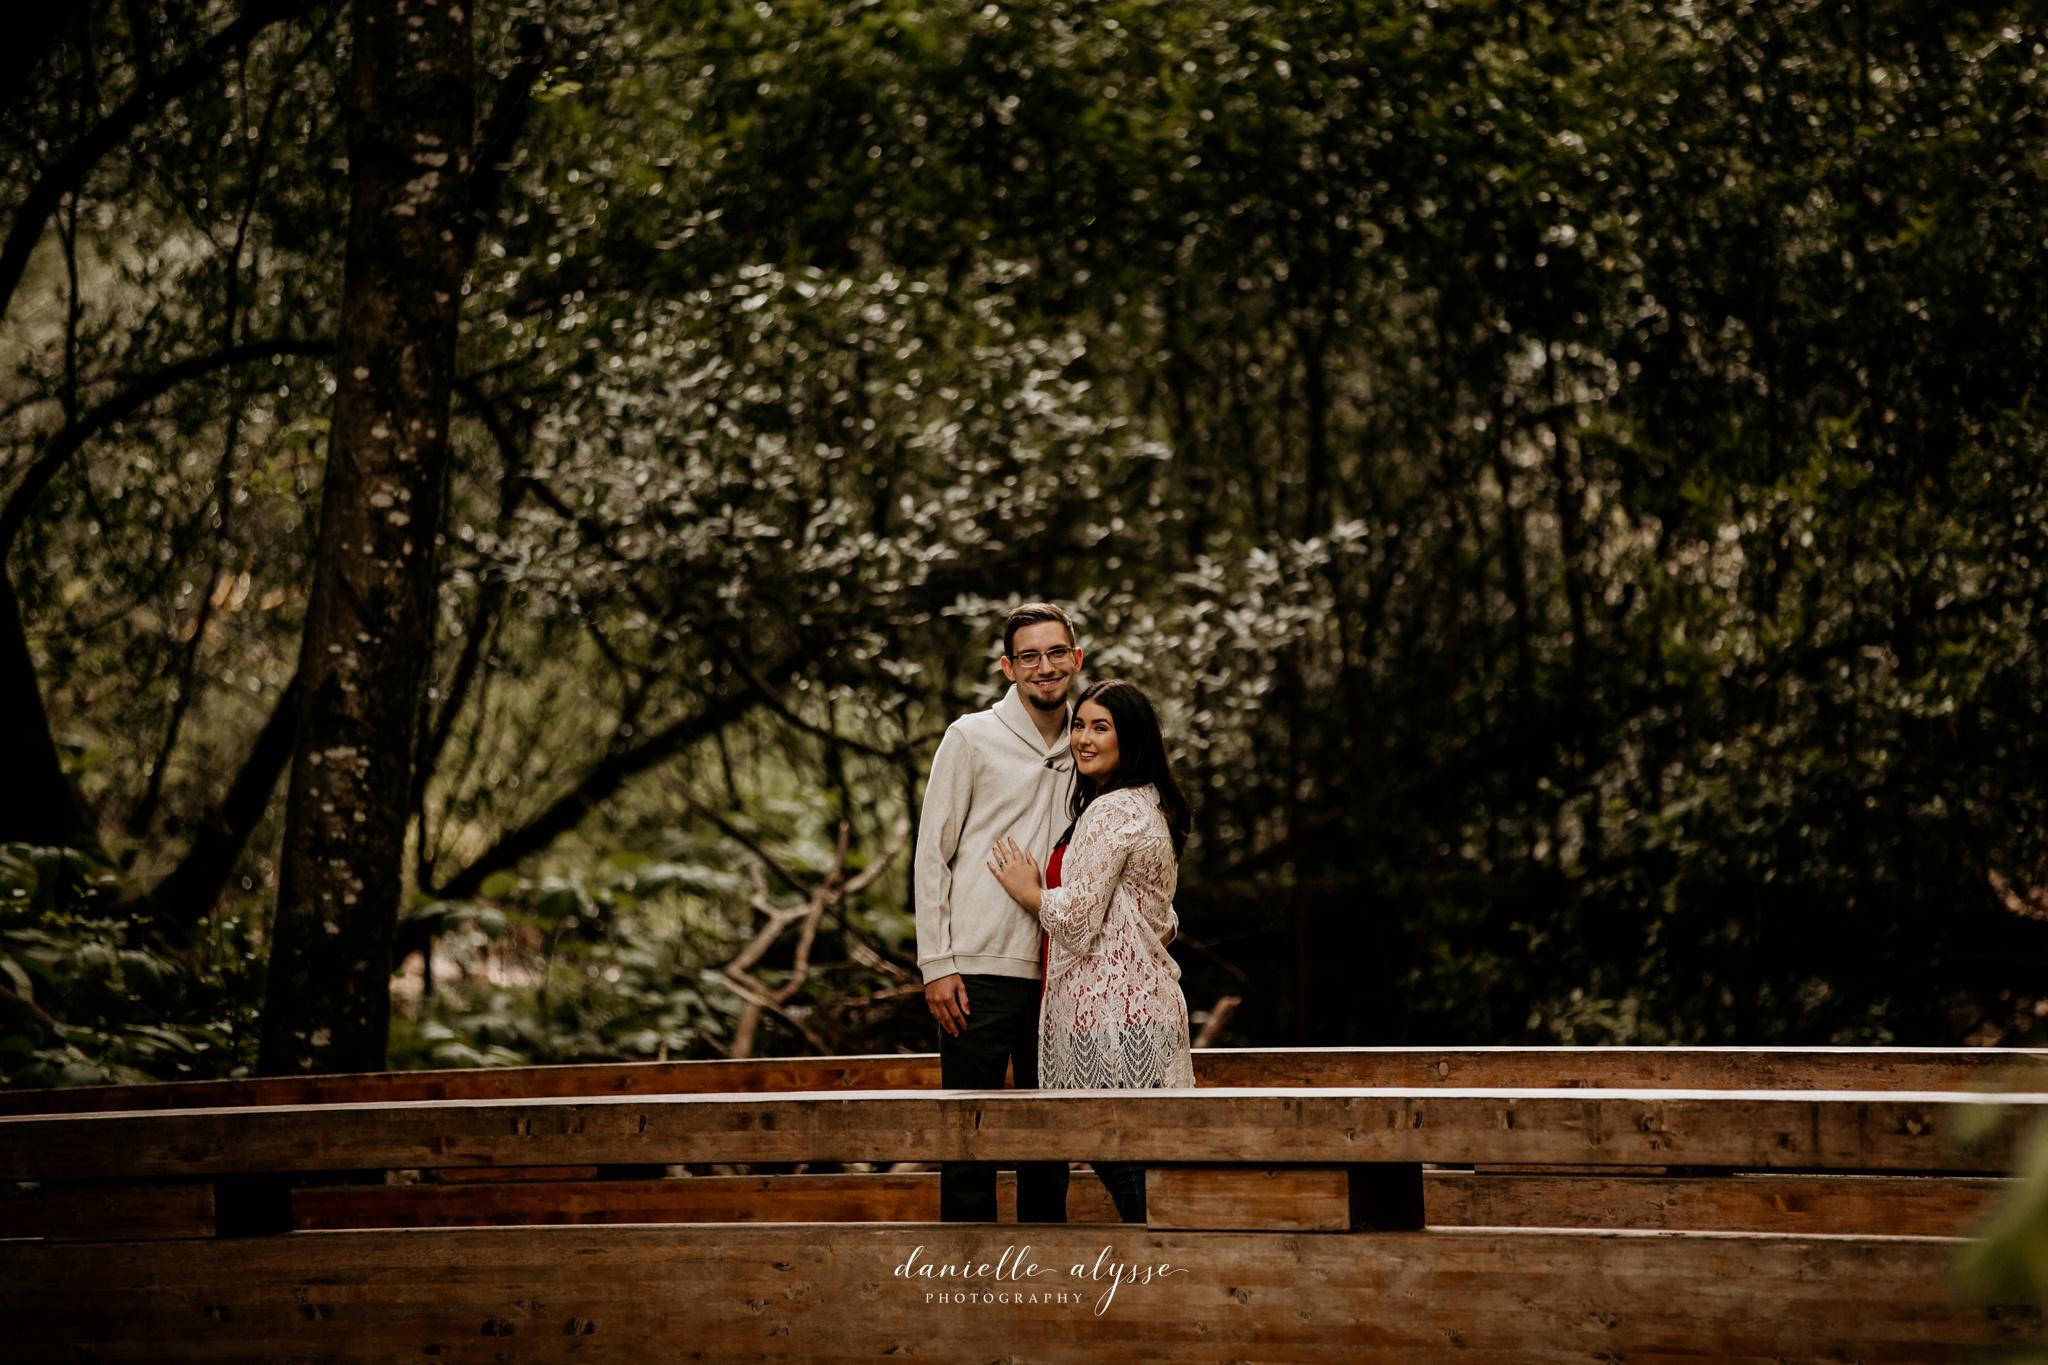 180503_engagement_bianca_muir_woods_mill_valley_danielle_alysse_photography_bay_area_photographer_blog_2_WEB.jpg